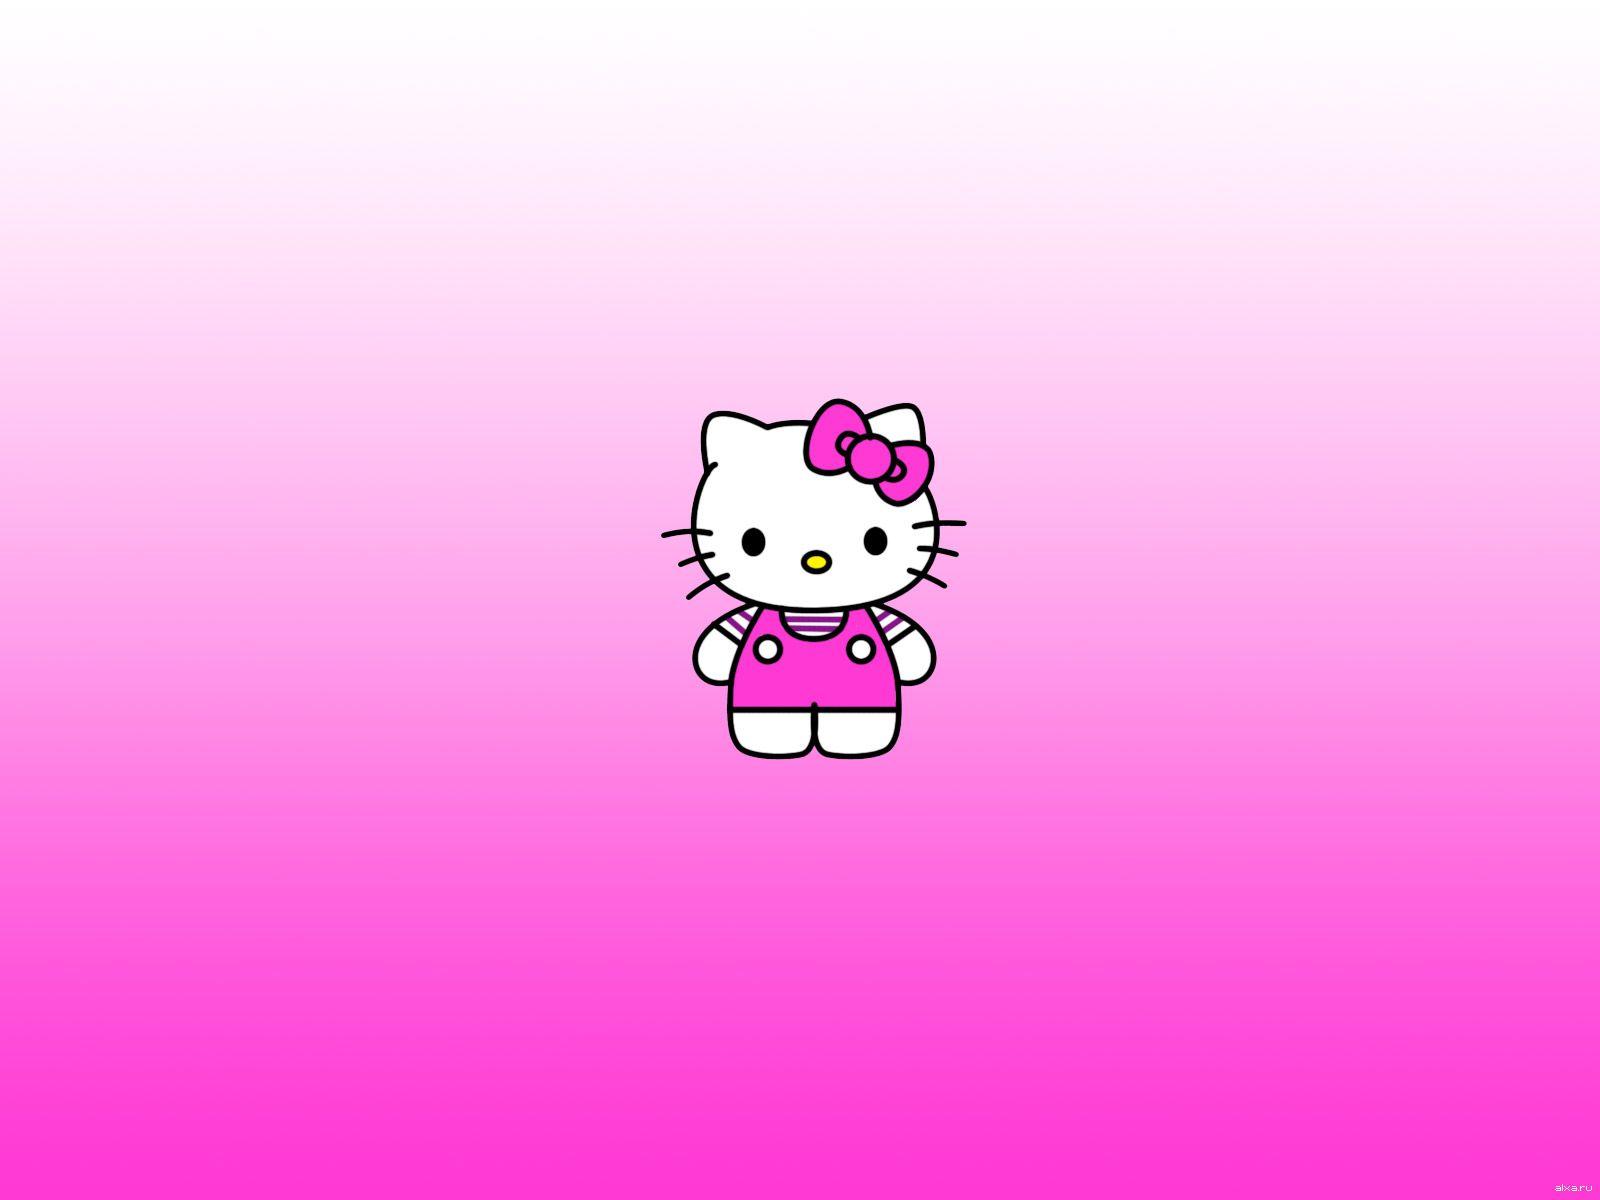 Pin By Steffi Degenhardt On Hello Kitty Rocks Hello Kitty Bow Cute Hello Kitty Wallpaper Hello Kitty Pink Wallpaper